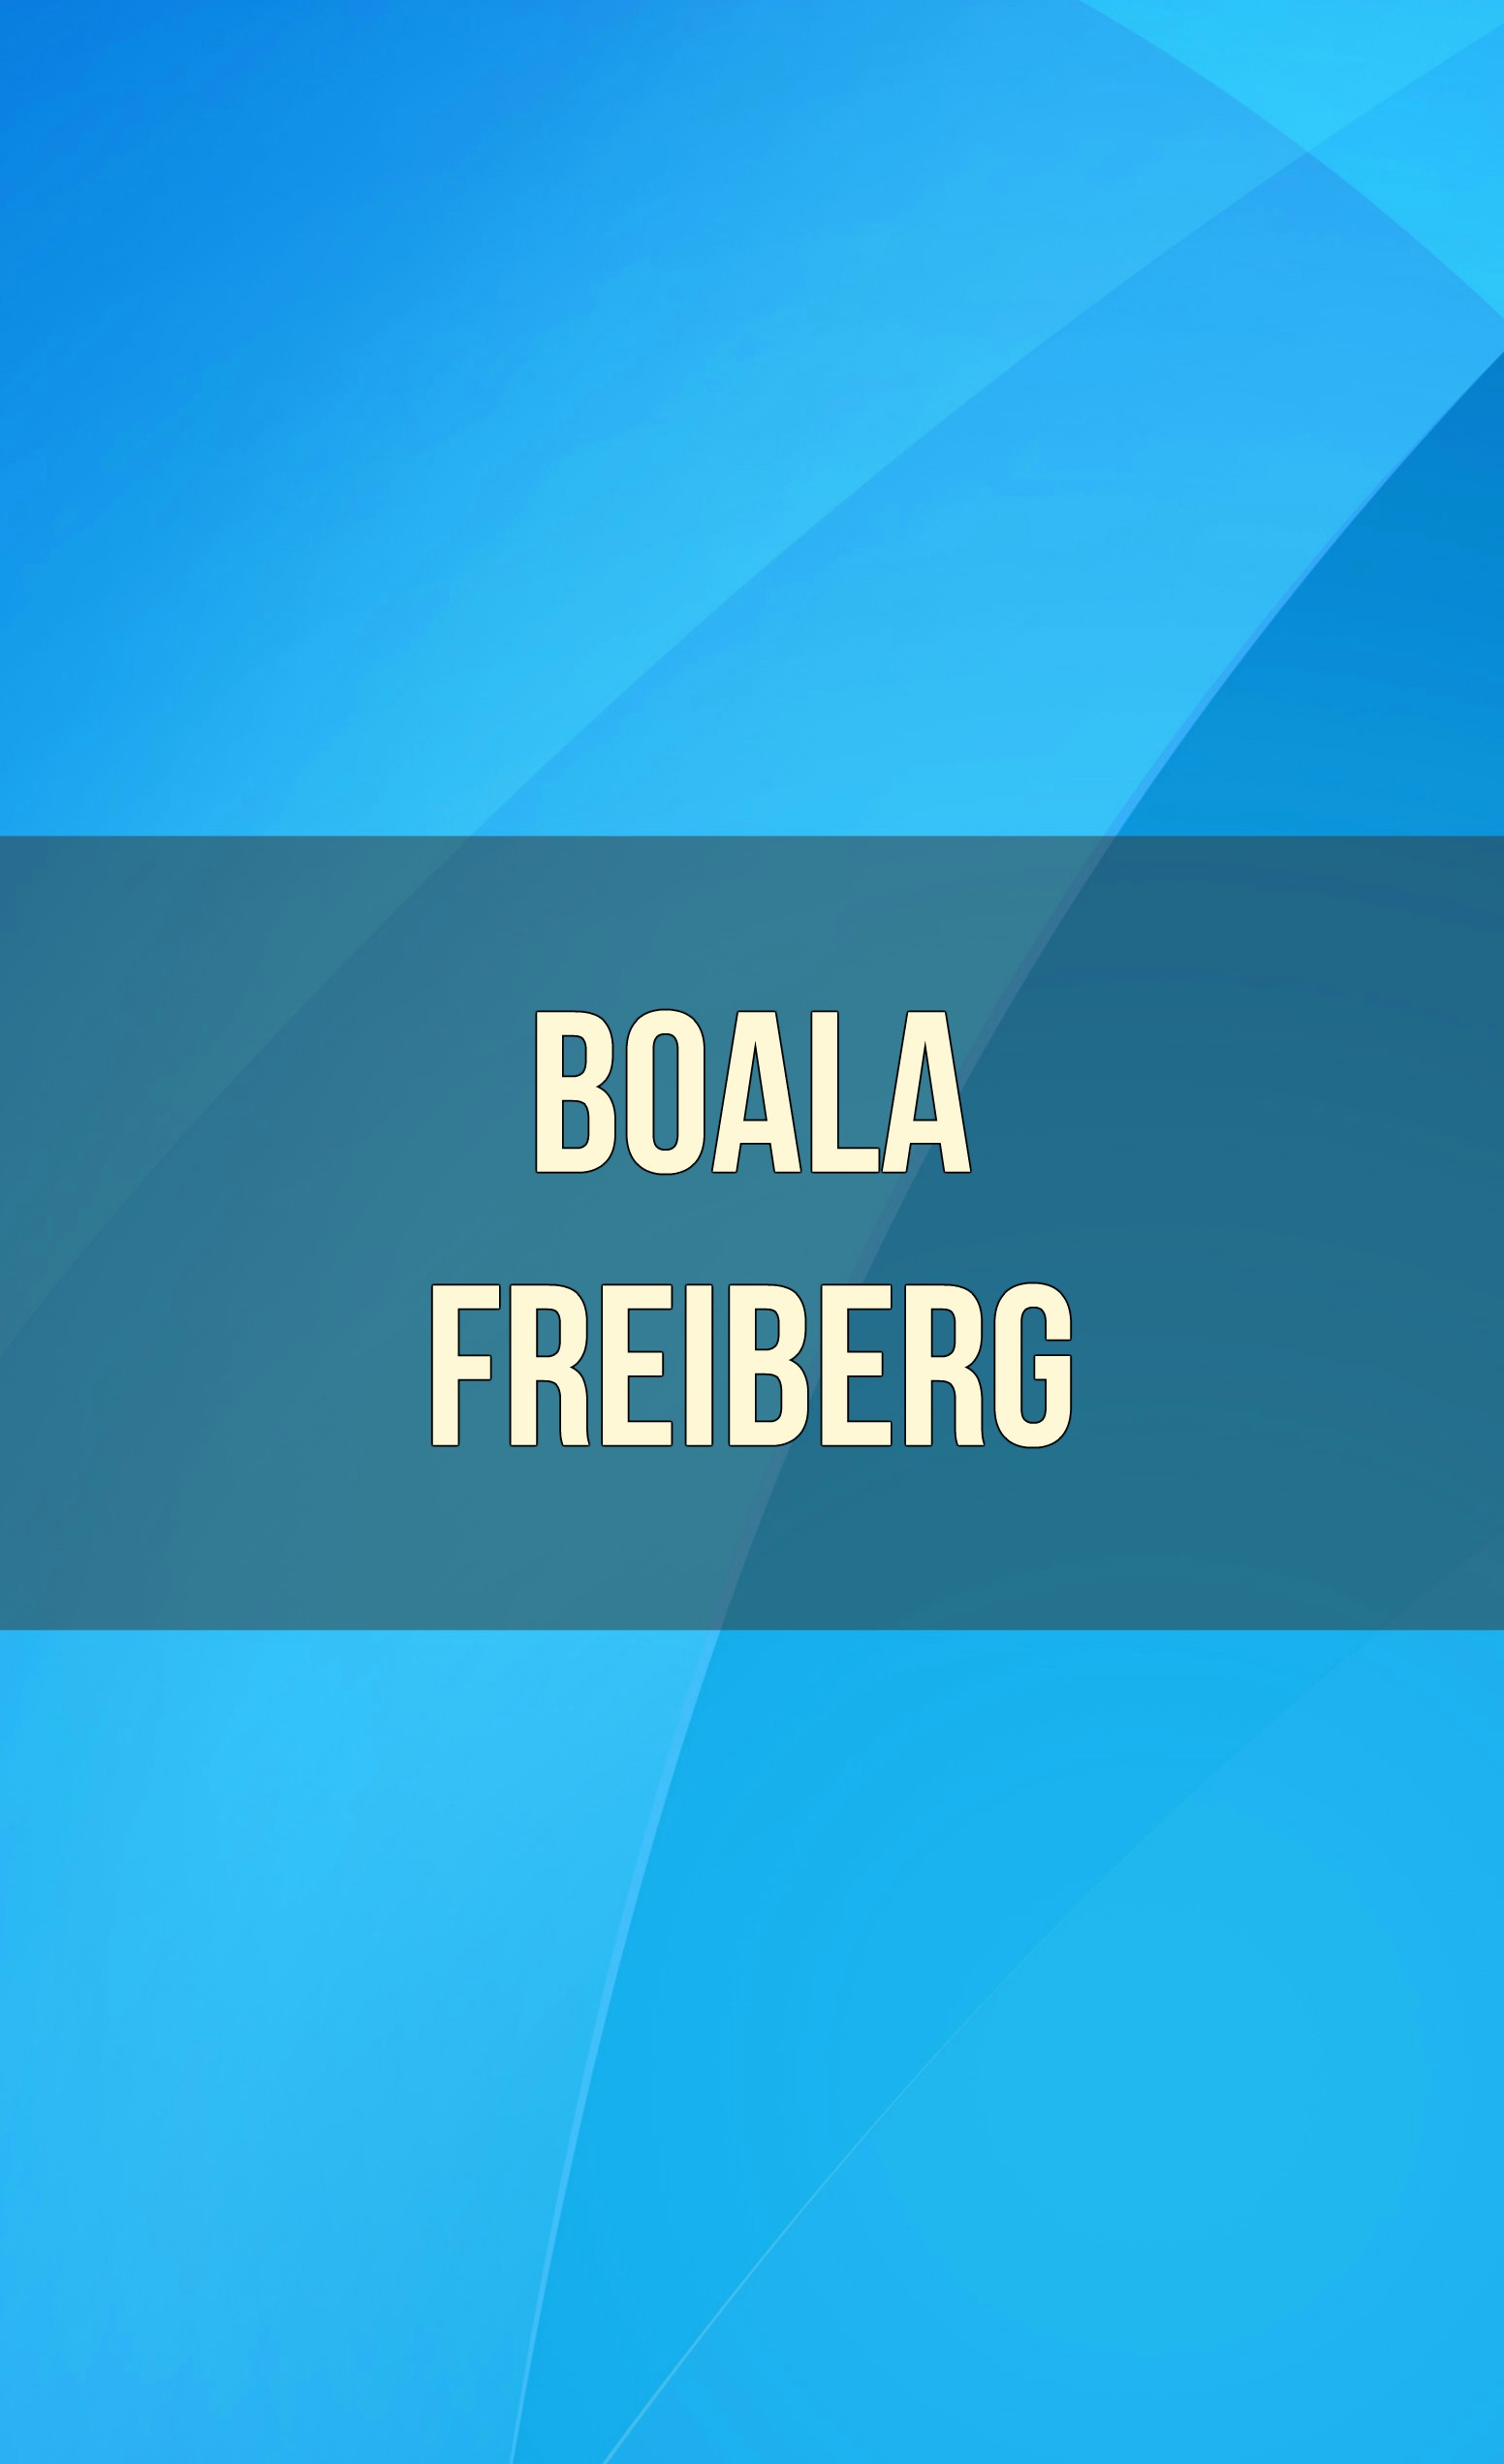 Boala Freiberg